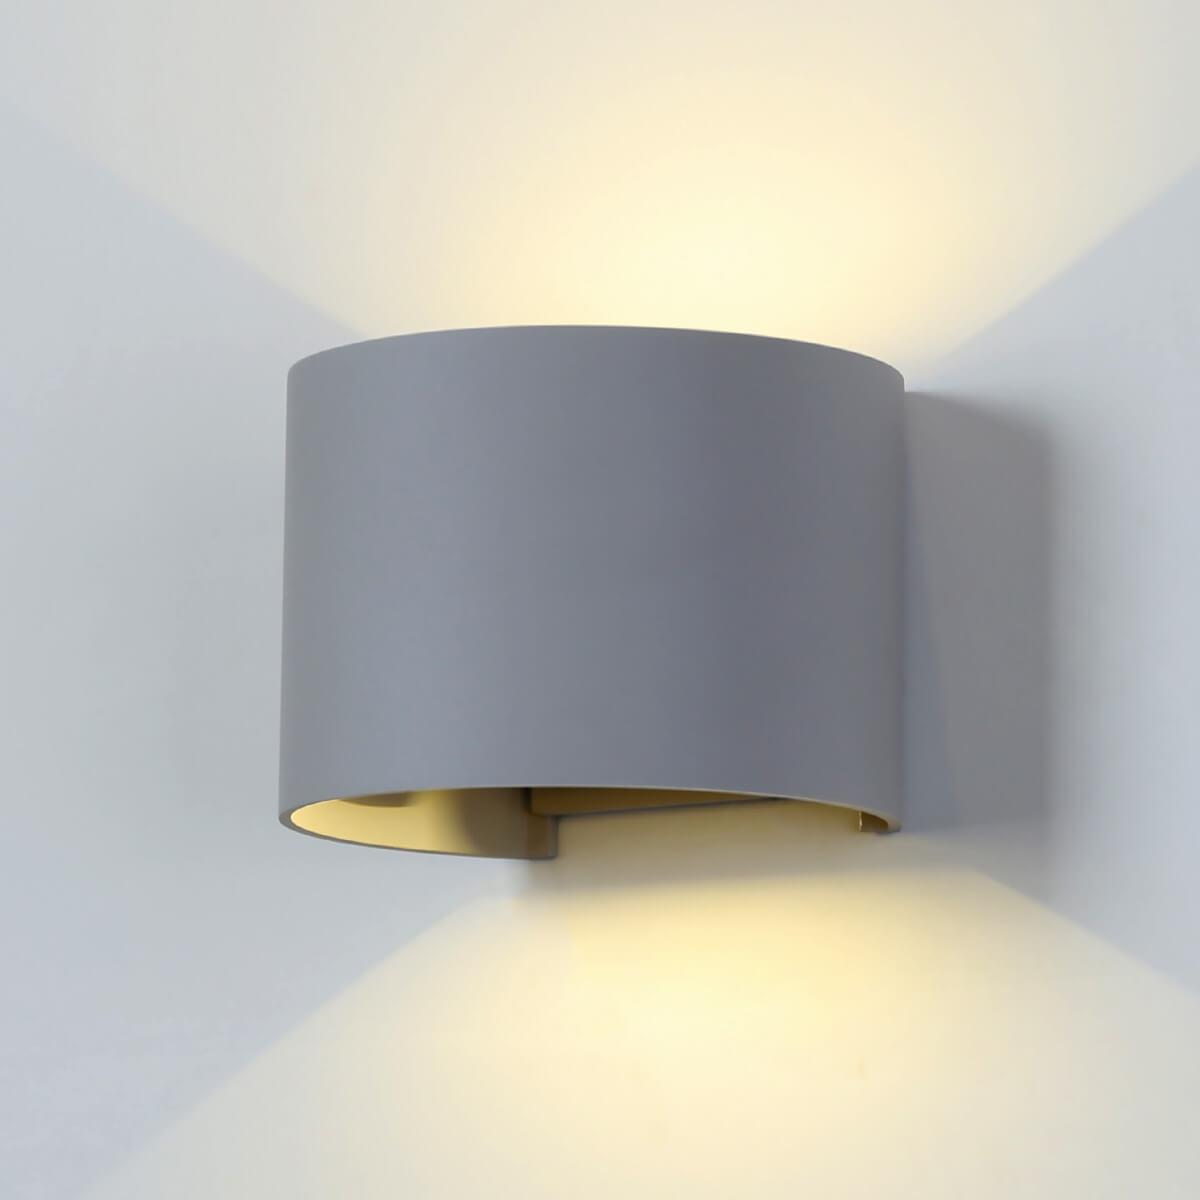 Уличный светильник Elektrostandard 4690389108921, LED уличный настенный светодиодный светильник elektrostandard 1605 techno led sokar графит 4690389086038